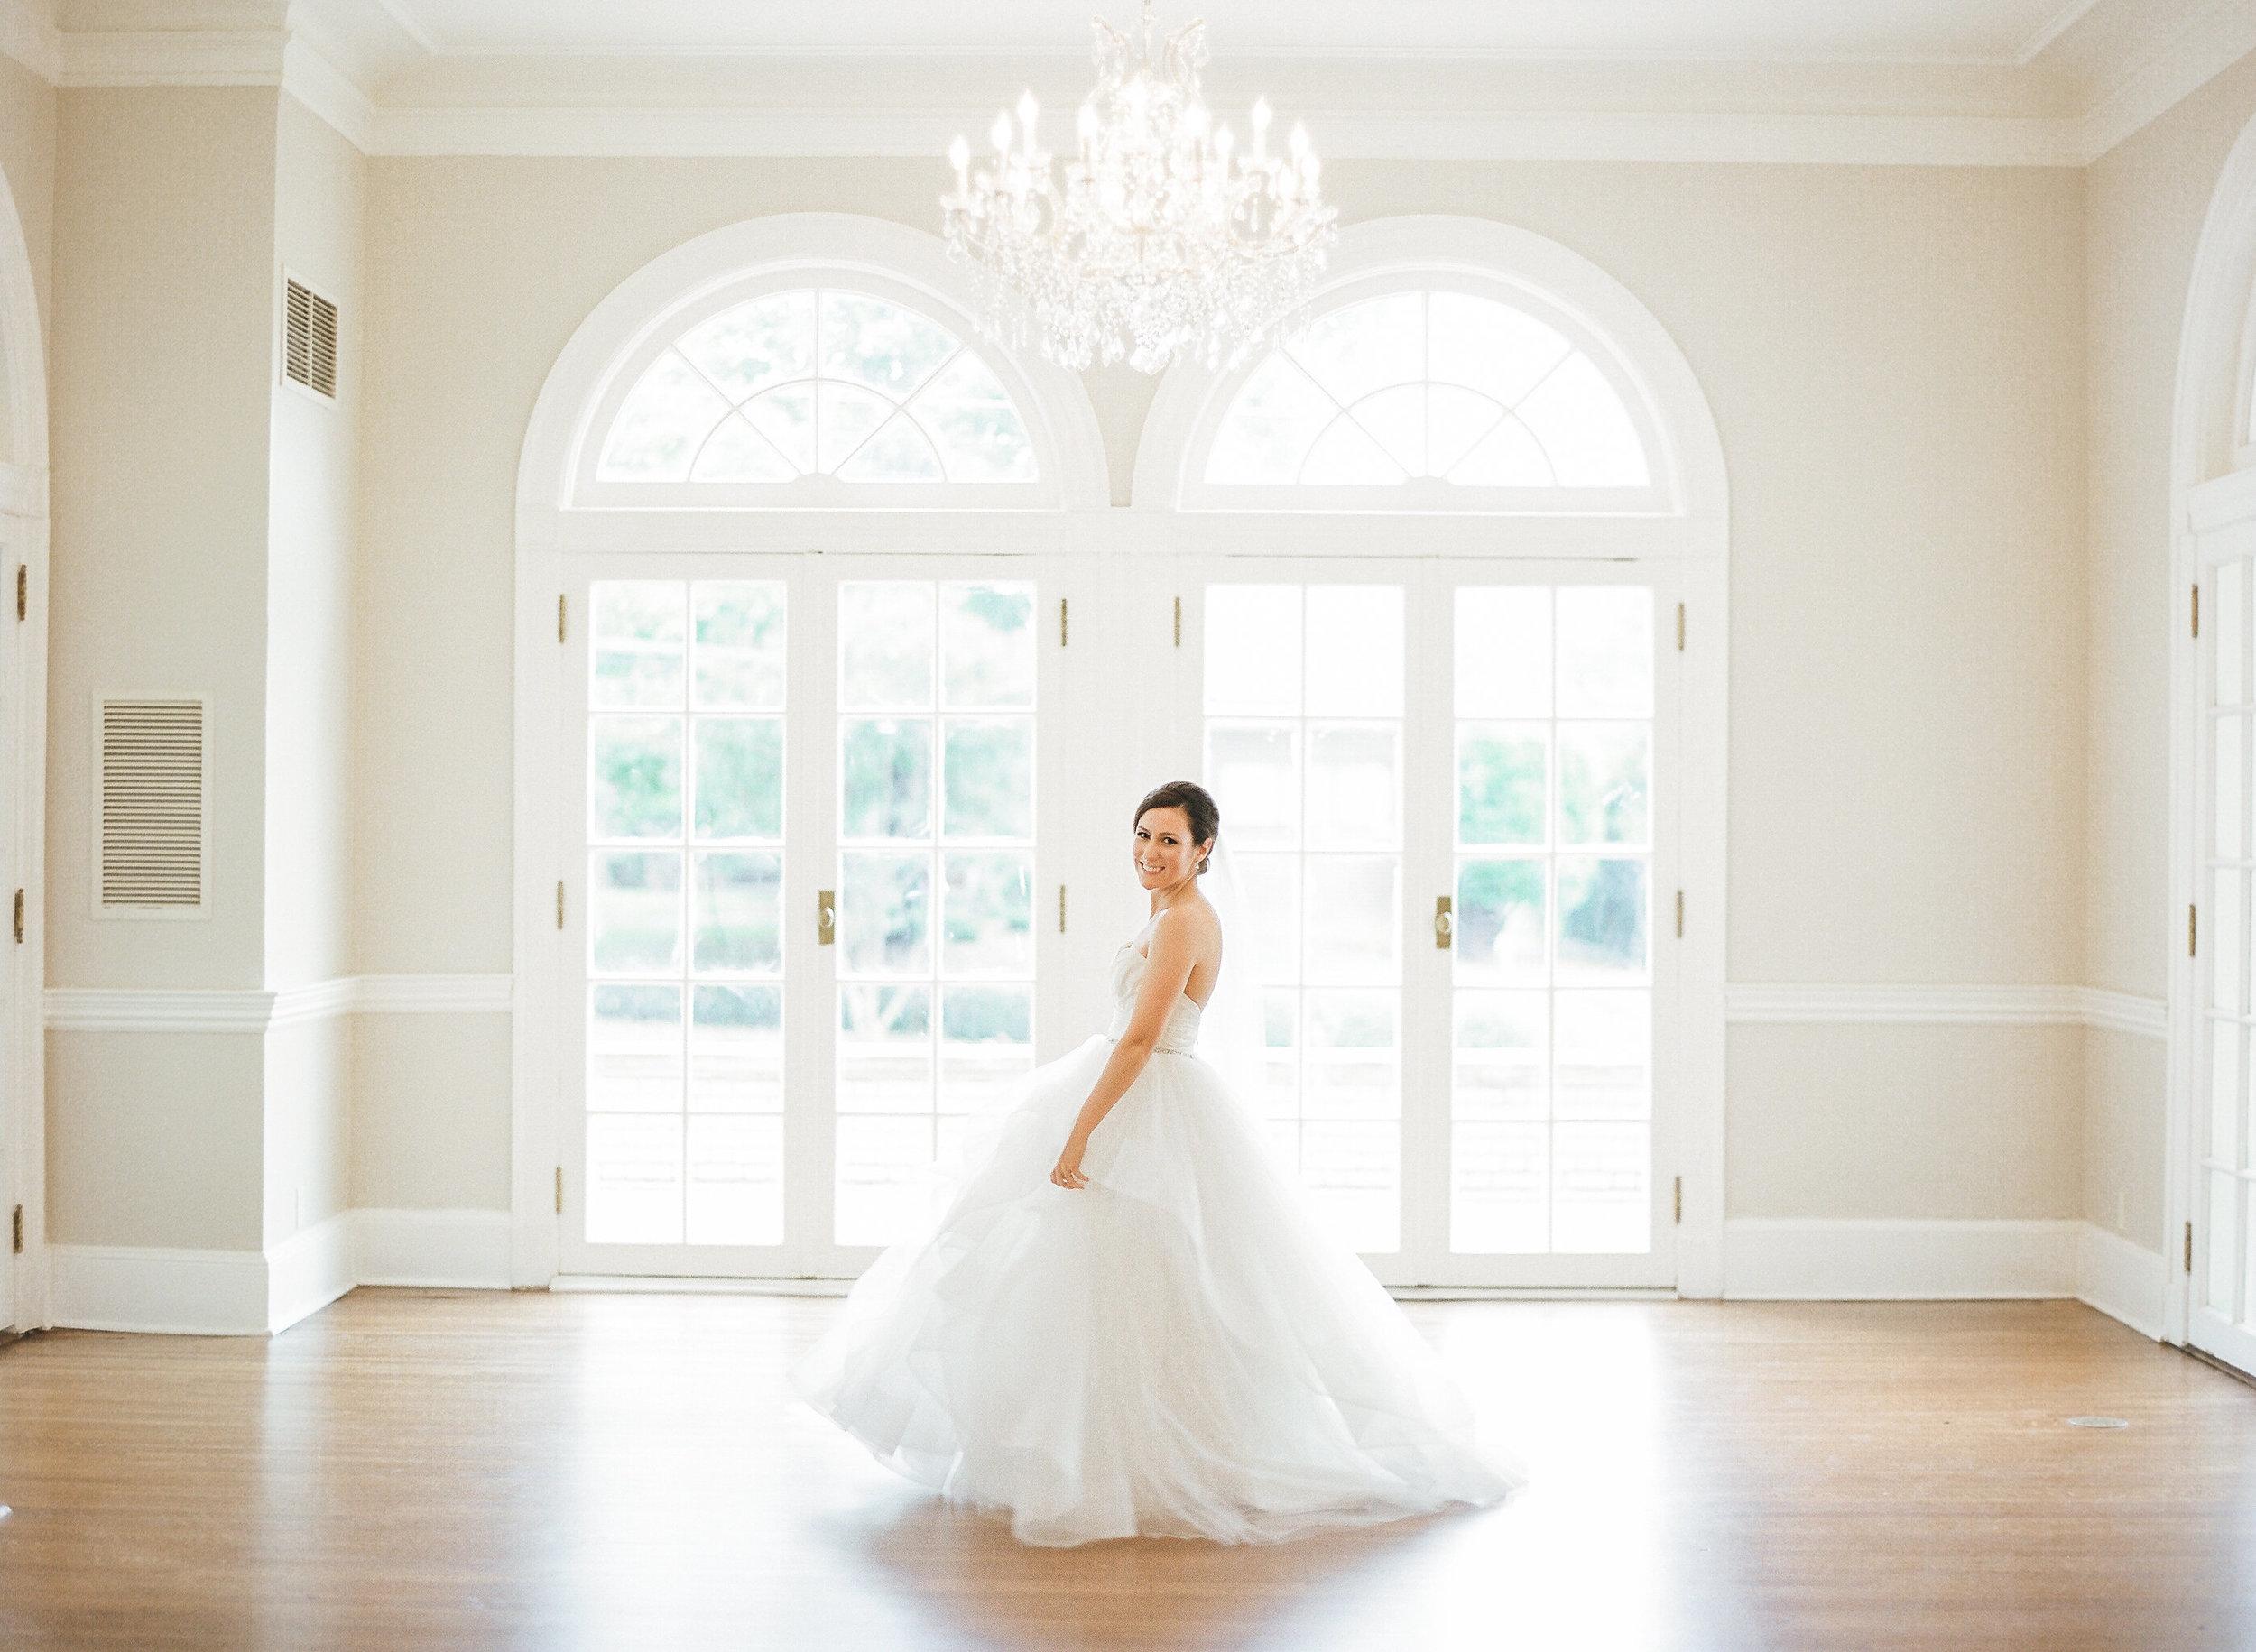 North-Carolina-Bridal-Photographer-Rebecca-9.jpg